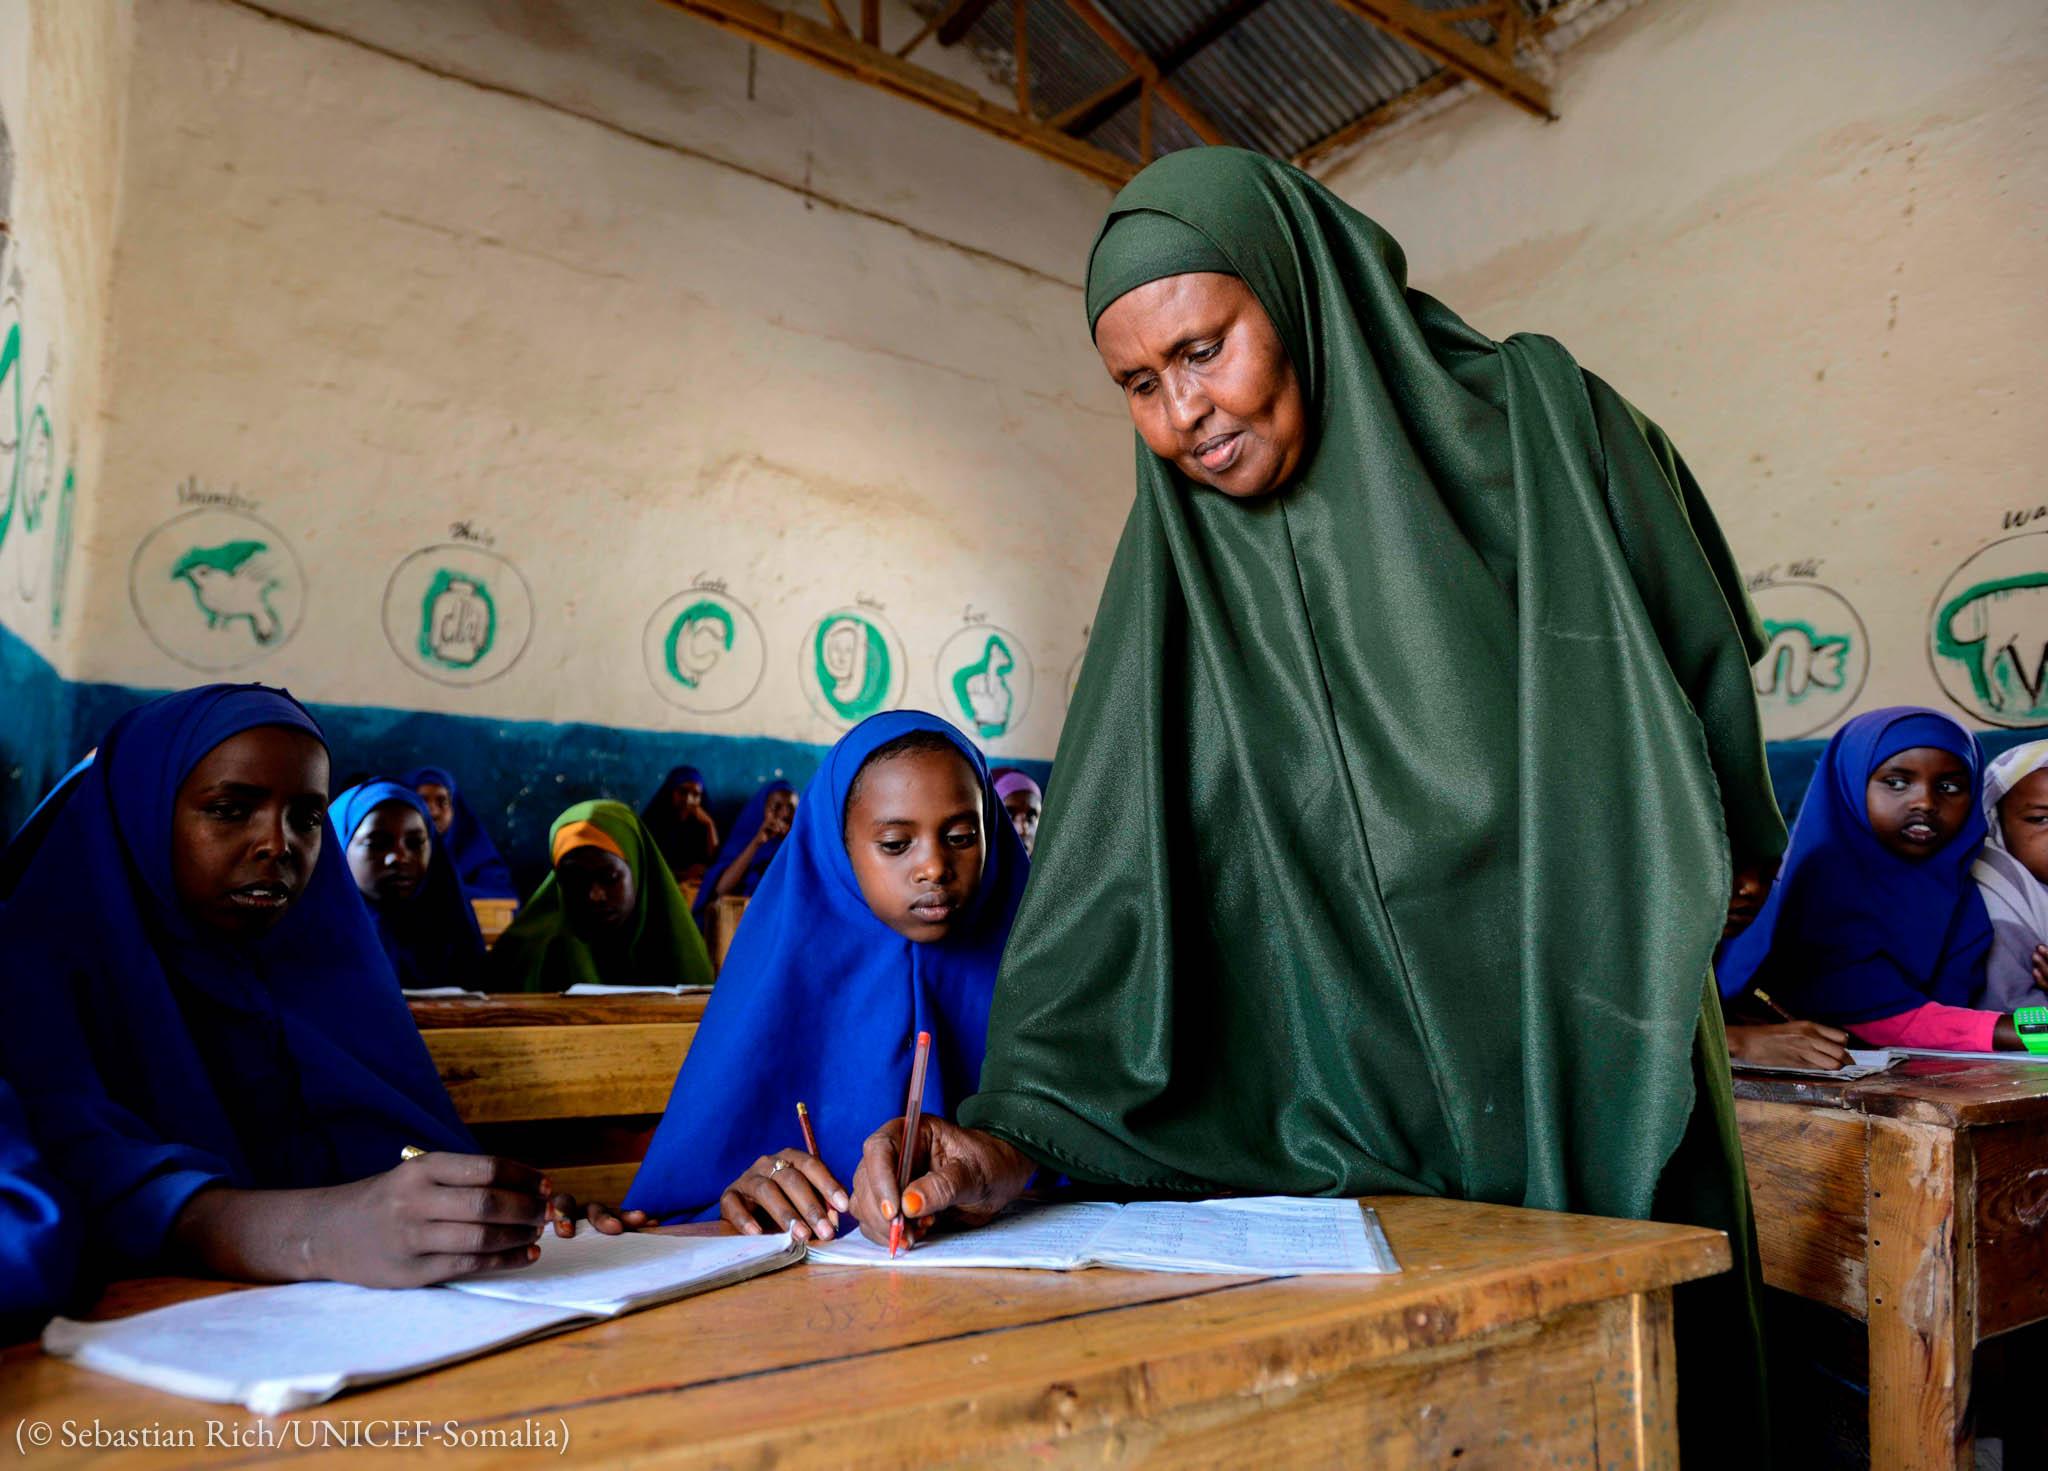 Teacher standing over a student's desk in a classroom (© Sebastain Rich/UNICEF)